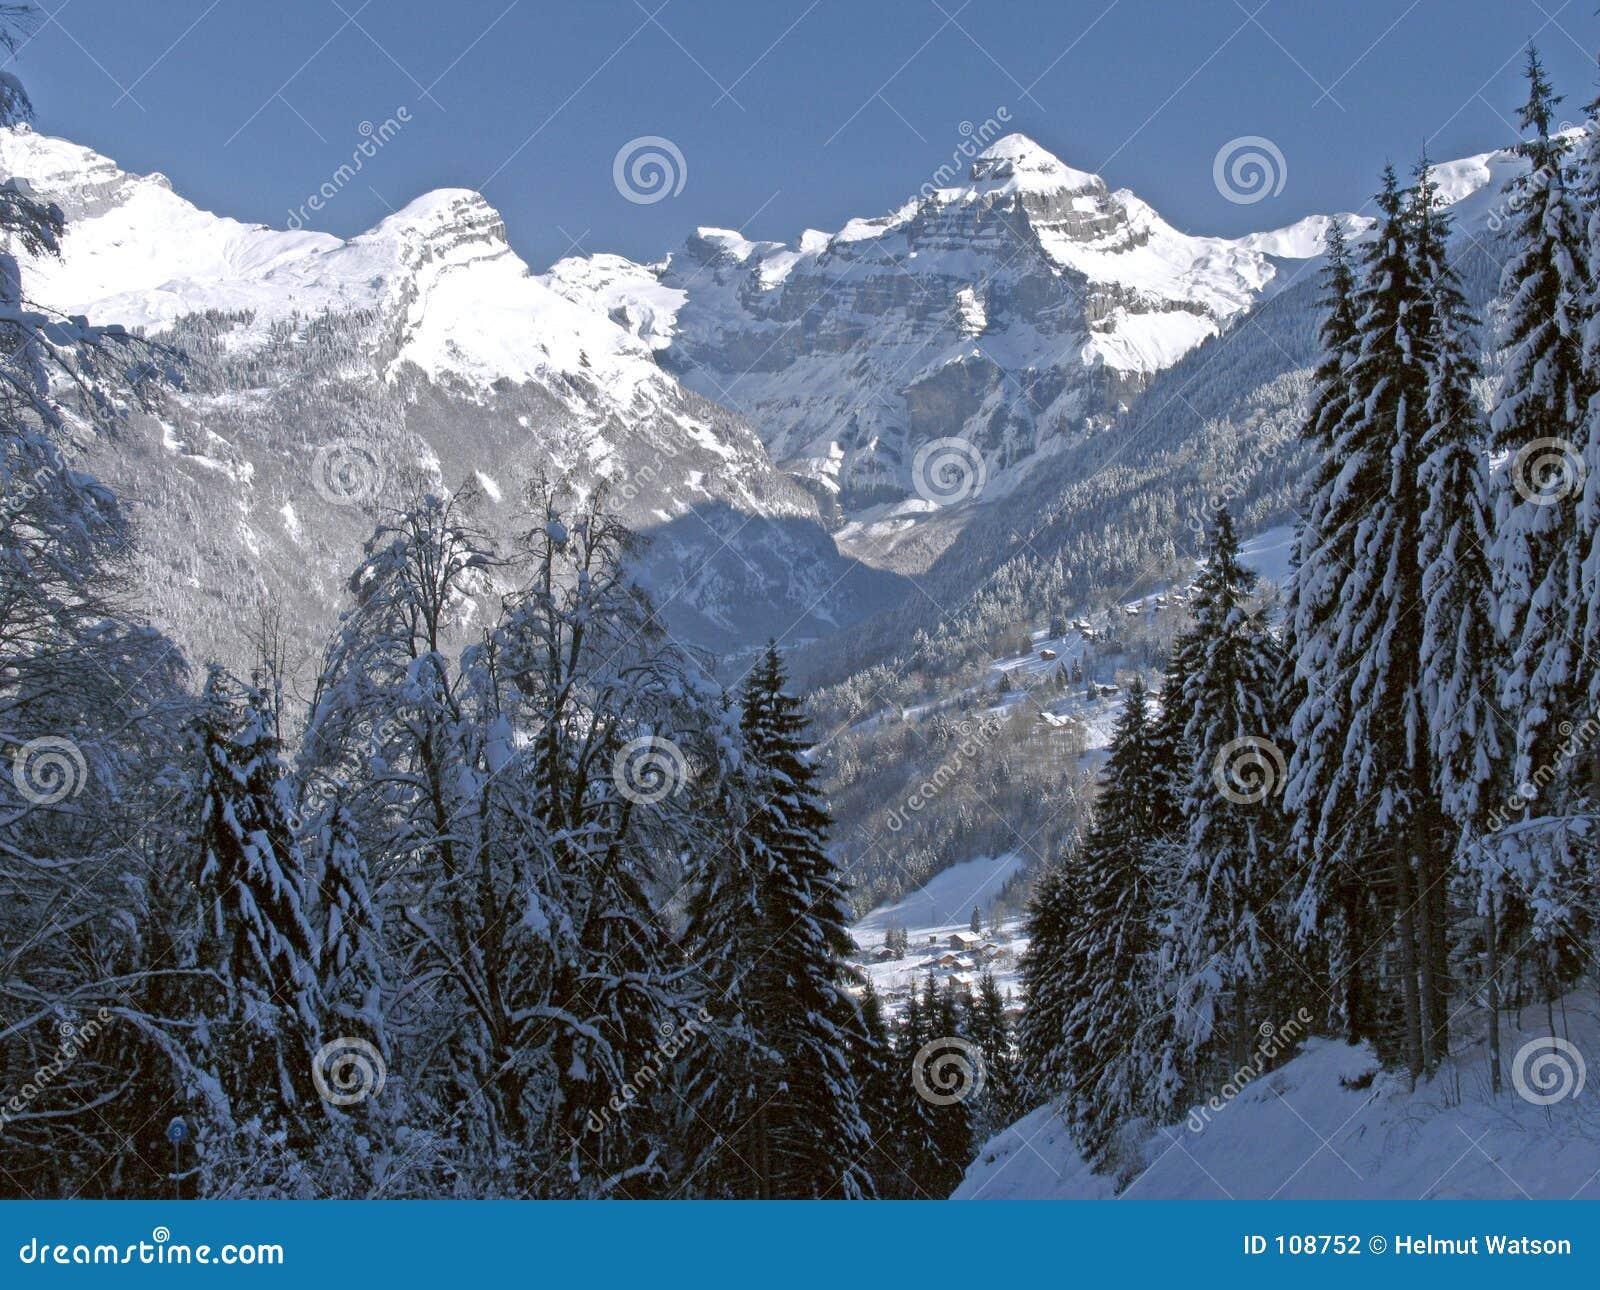 Flaine - vale Tree-lined com pico snow-capped